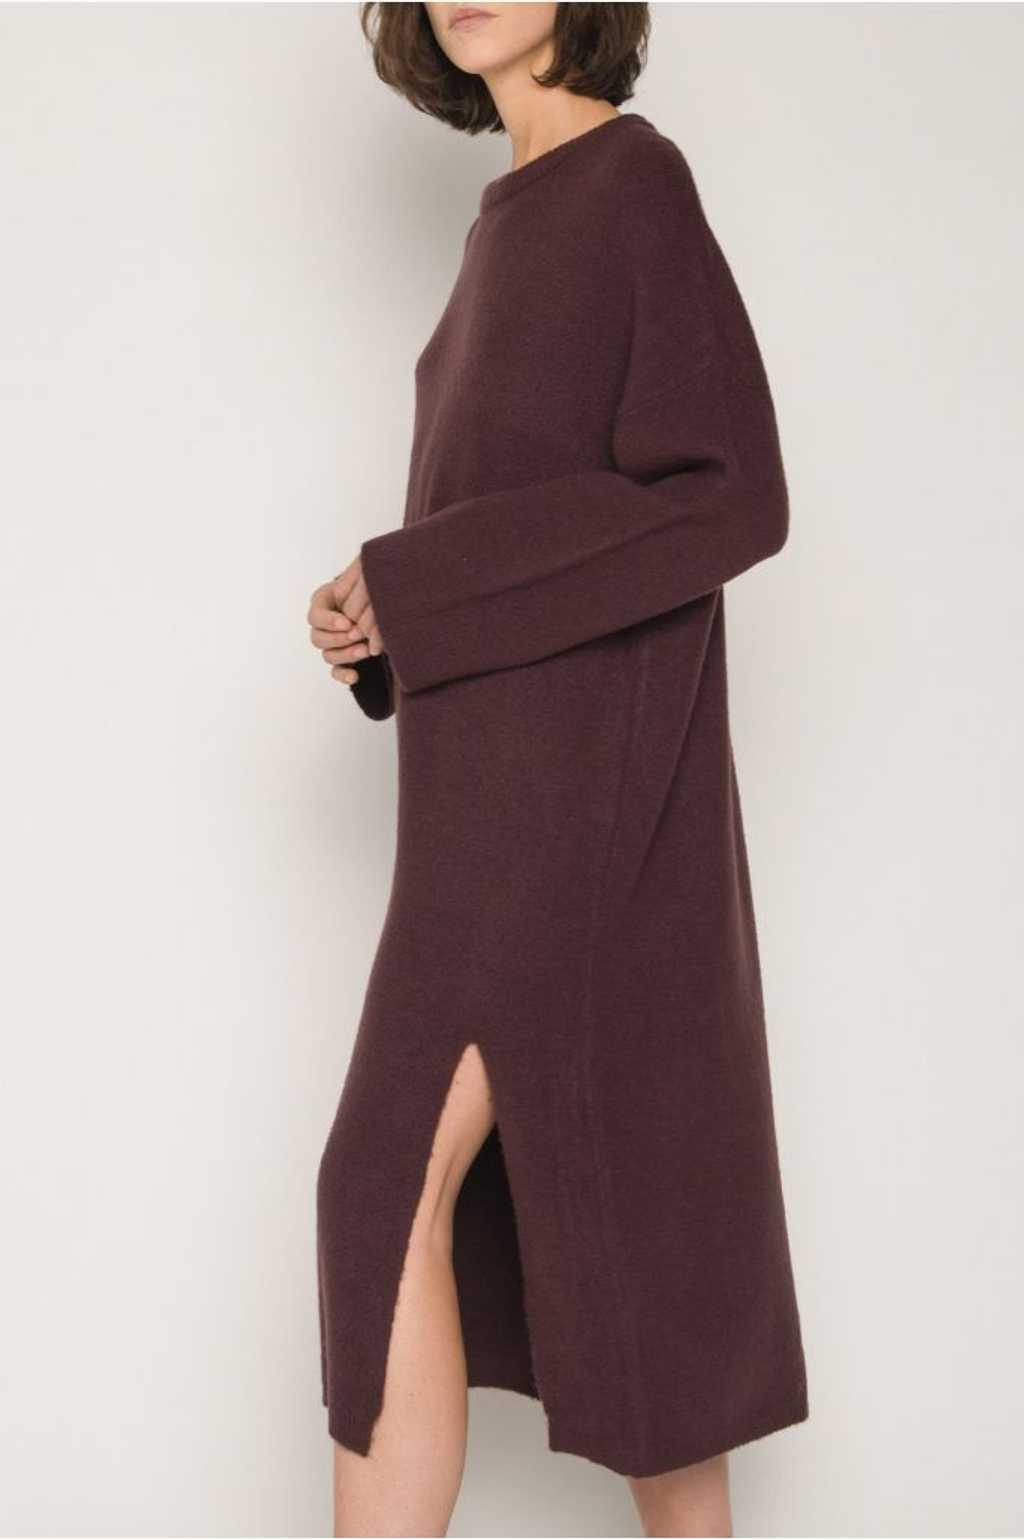 Dress 1648 Burgundy 6